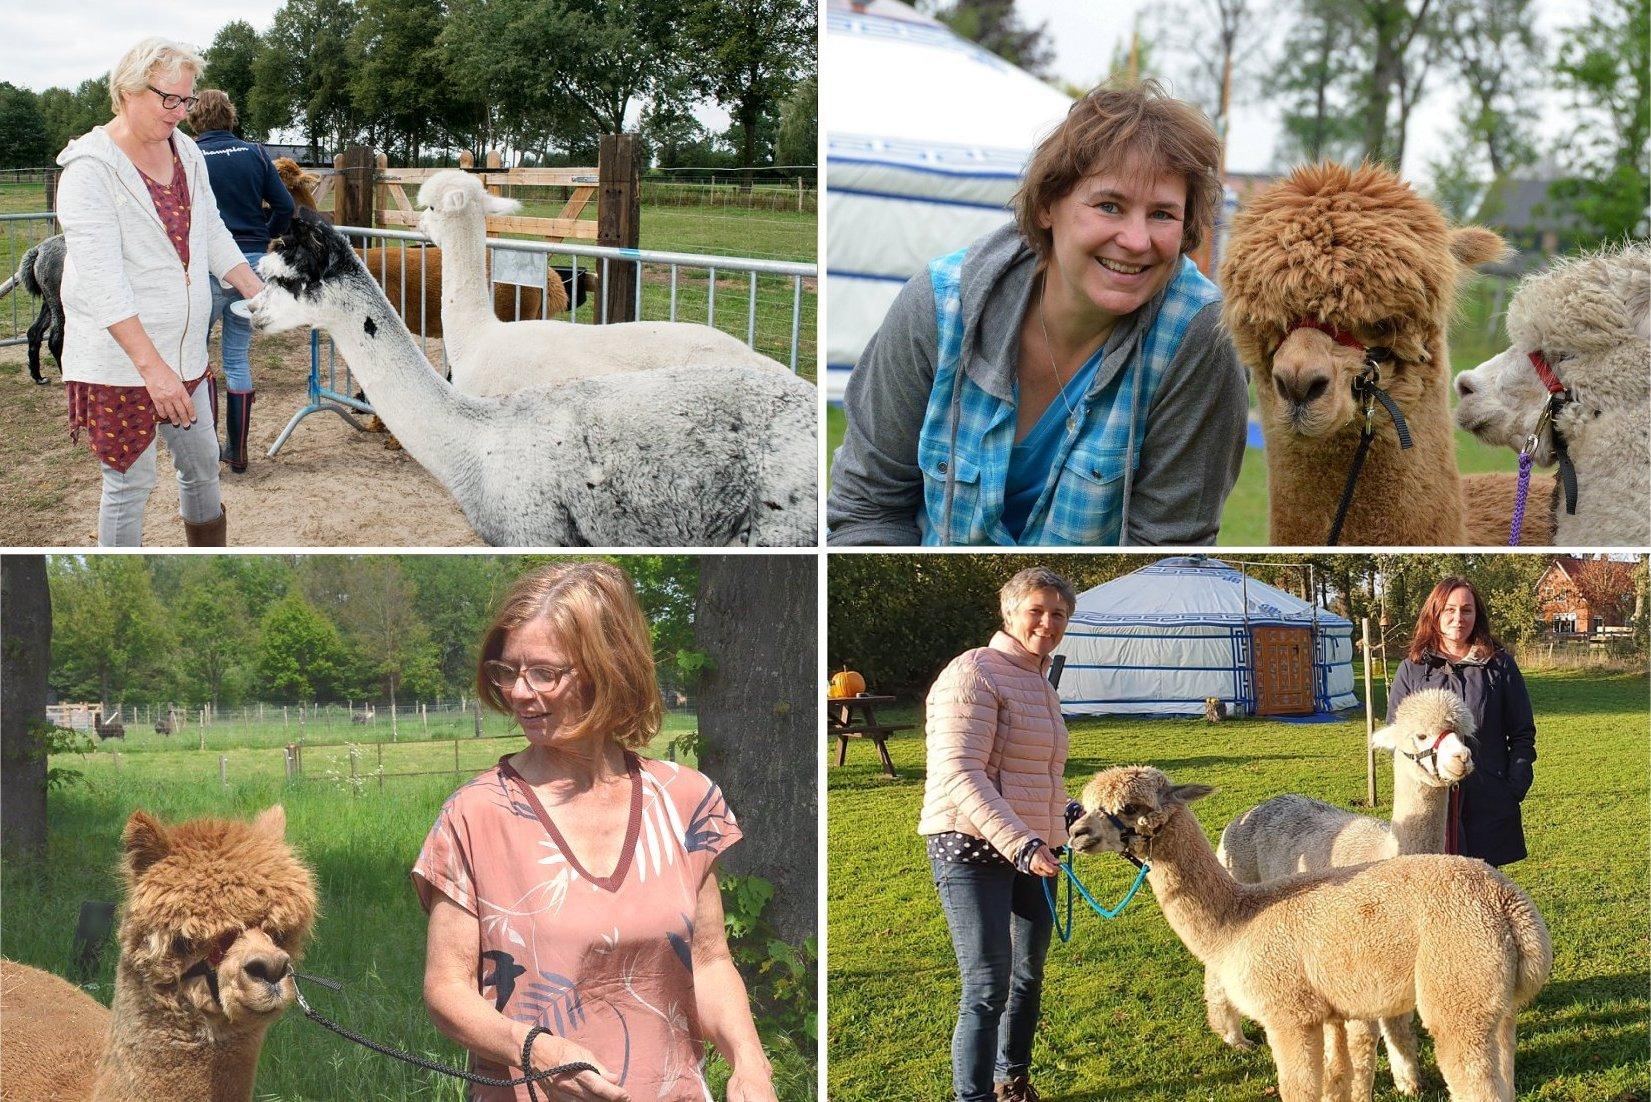 alpaca-knuffelen-wandelen-meet-greet-achterhoek-berkelland